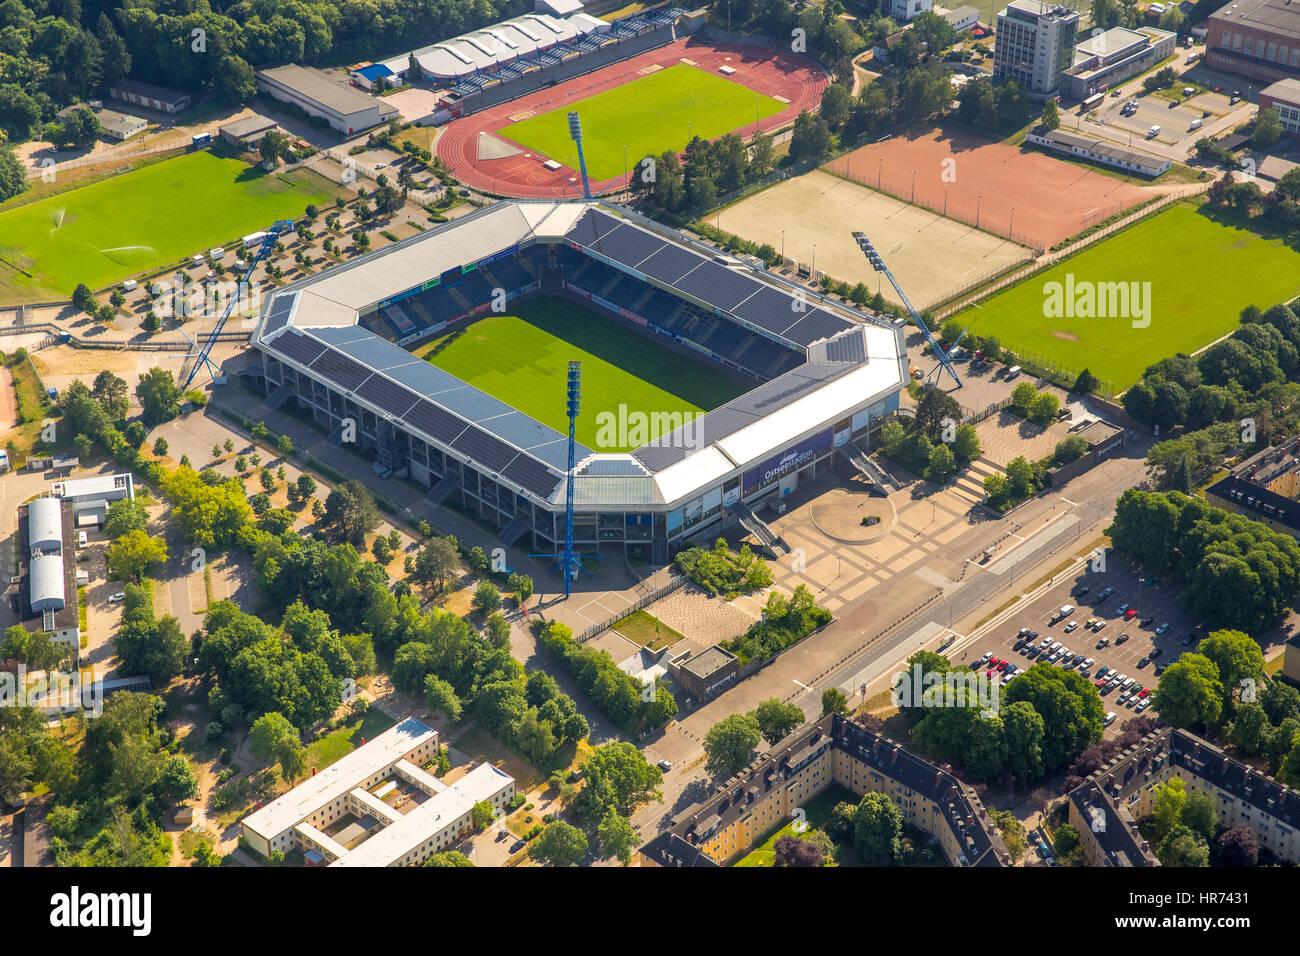 Ostsee Stadium Premiere League Stadium Fc Hansa Rostock Rostock Stock Photo Alamy